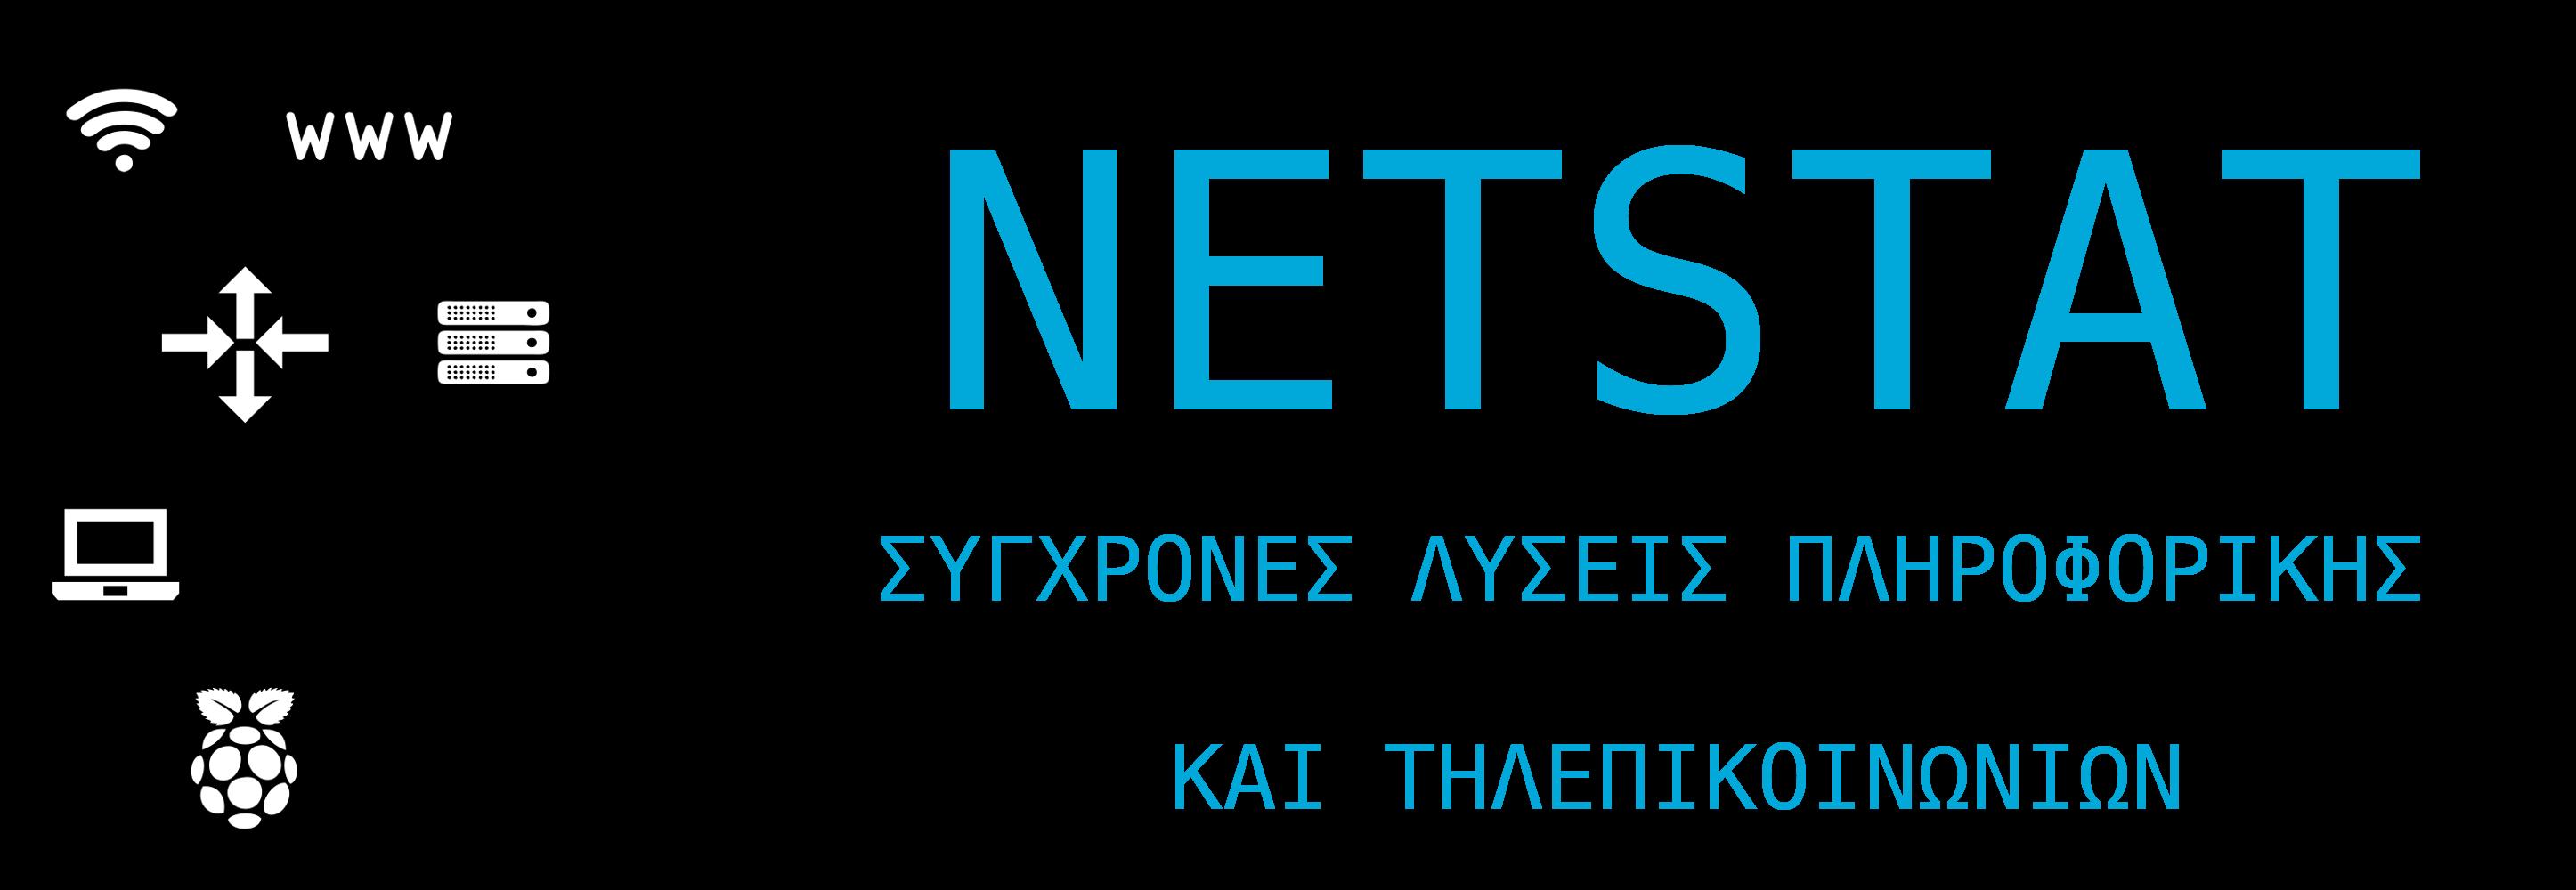 NetStat – Σύγχρονες Λύσεις Πληροφορικής